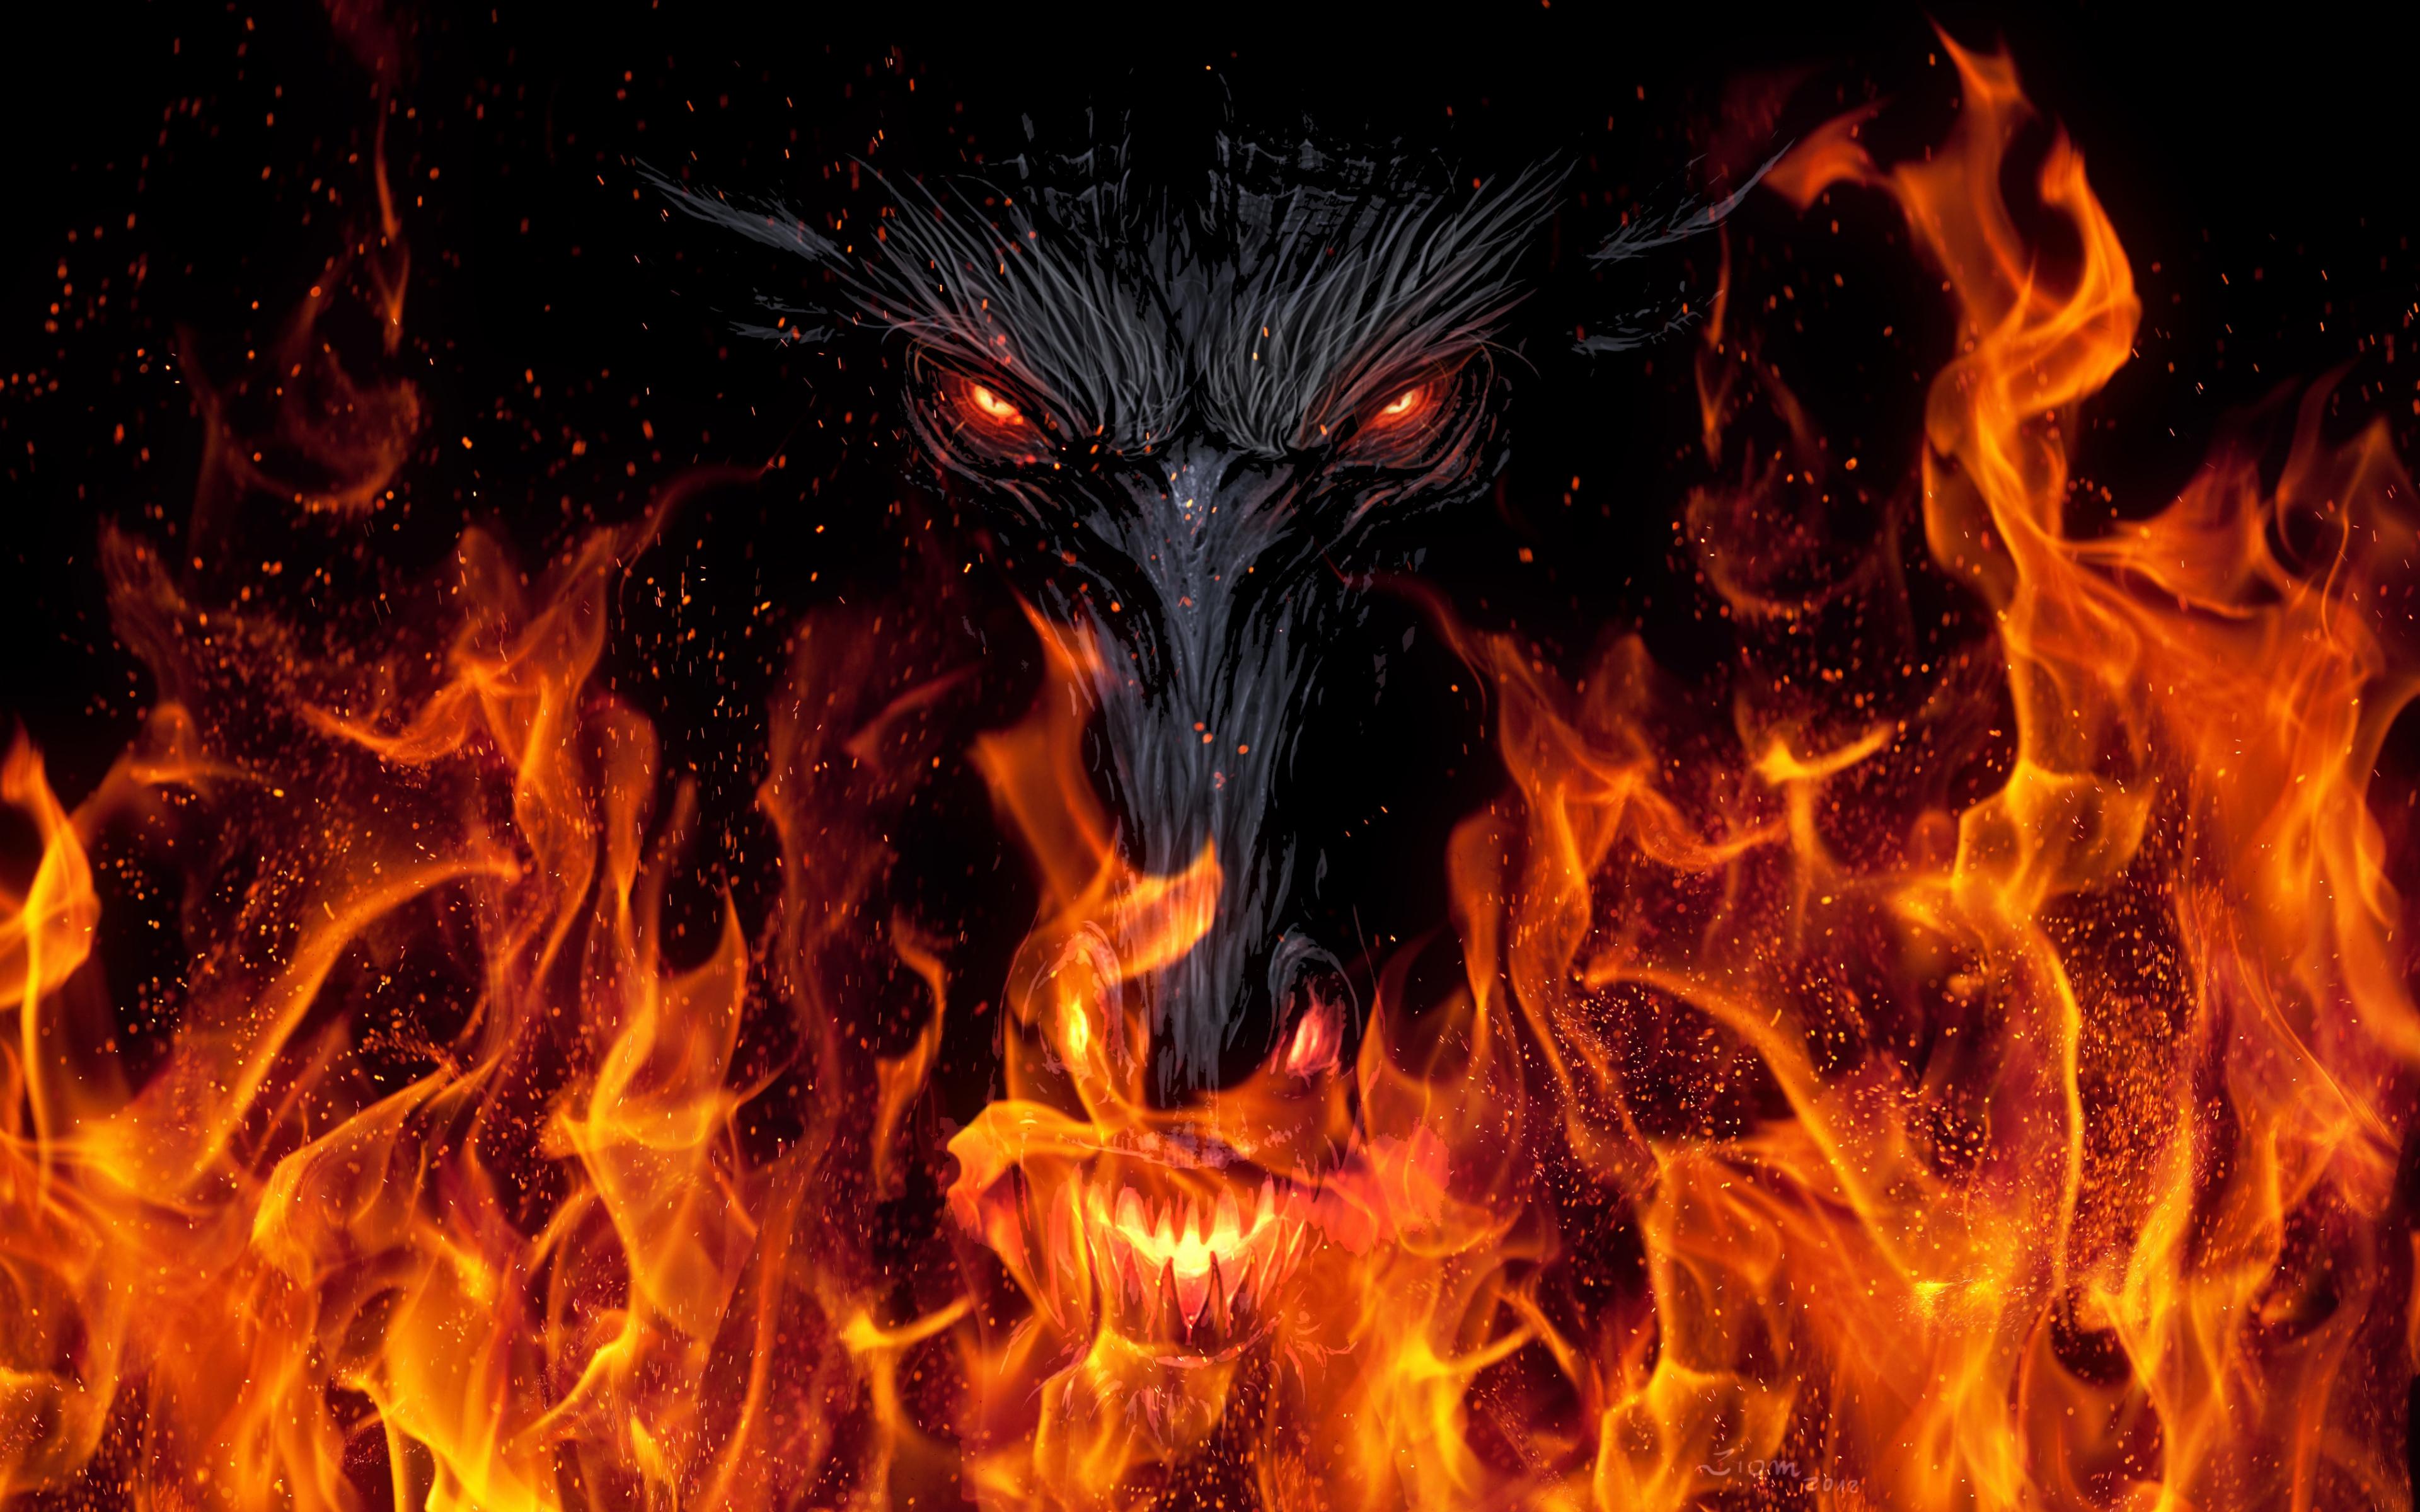 Download 3840x2400 Wallpaper Devil S Face Fire Dark